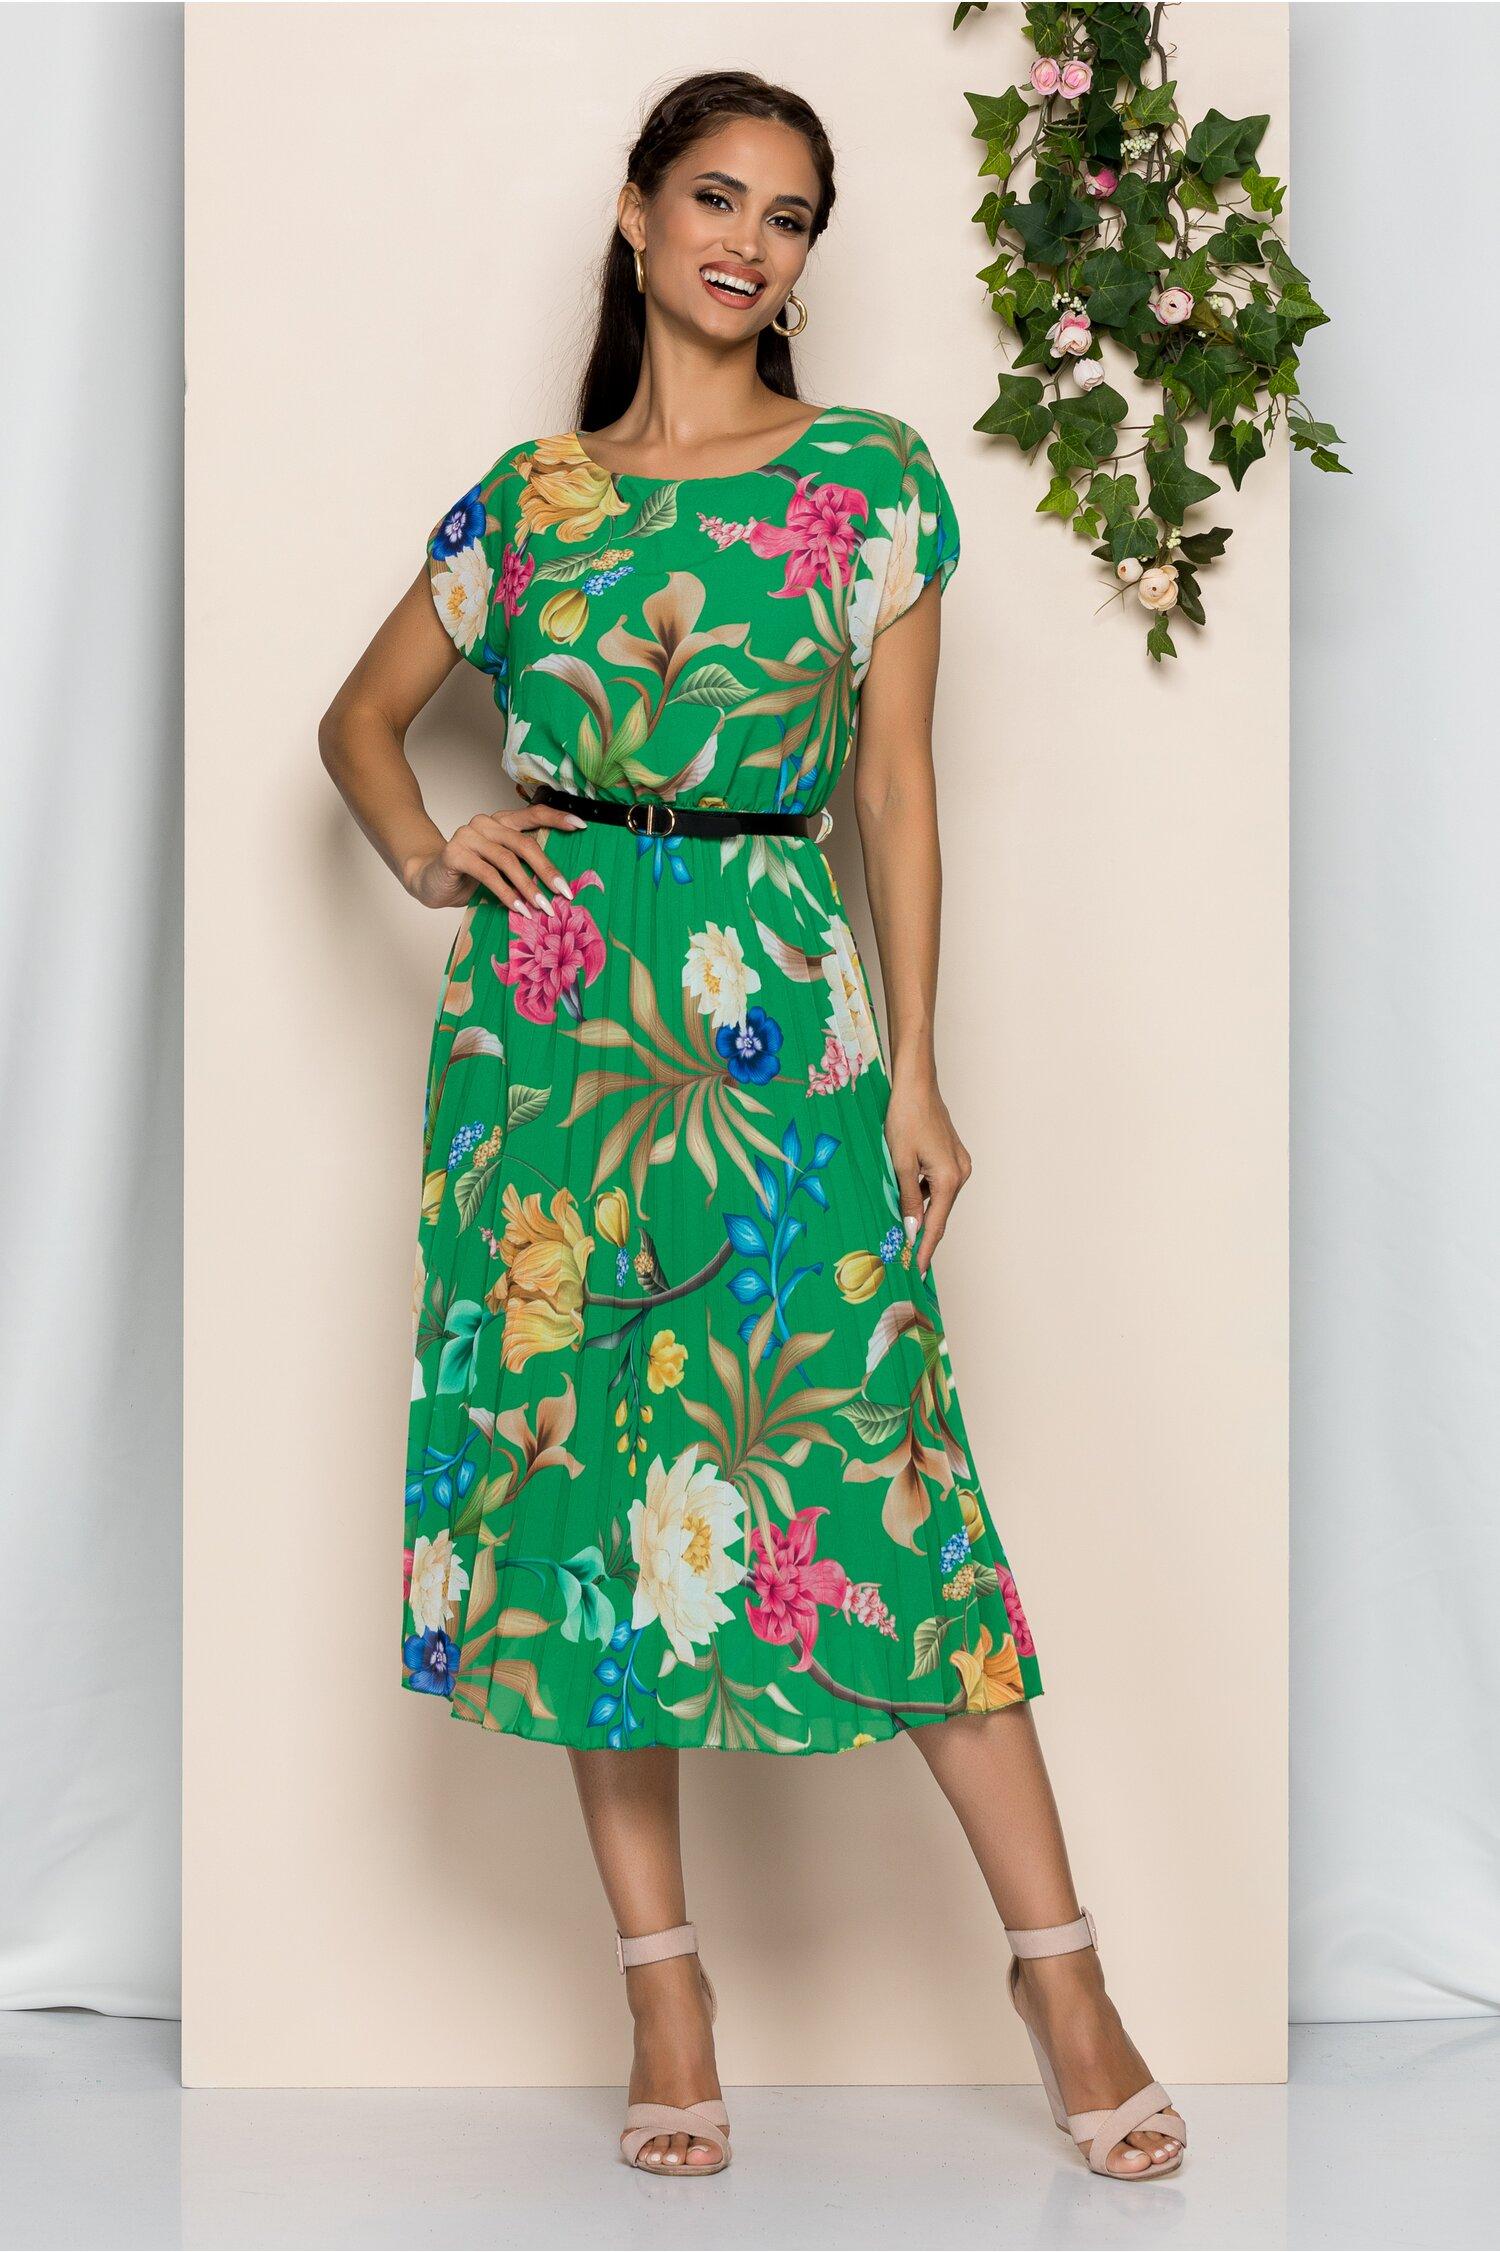 Rochie Manuela verde cu imprimeu floral si pliuri pe fusta